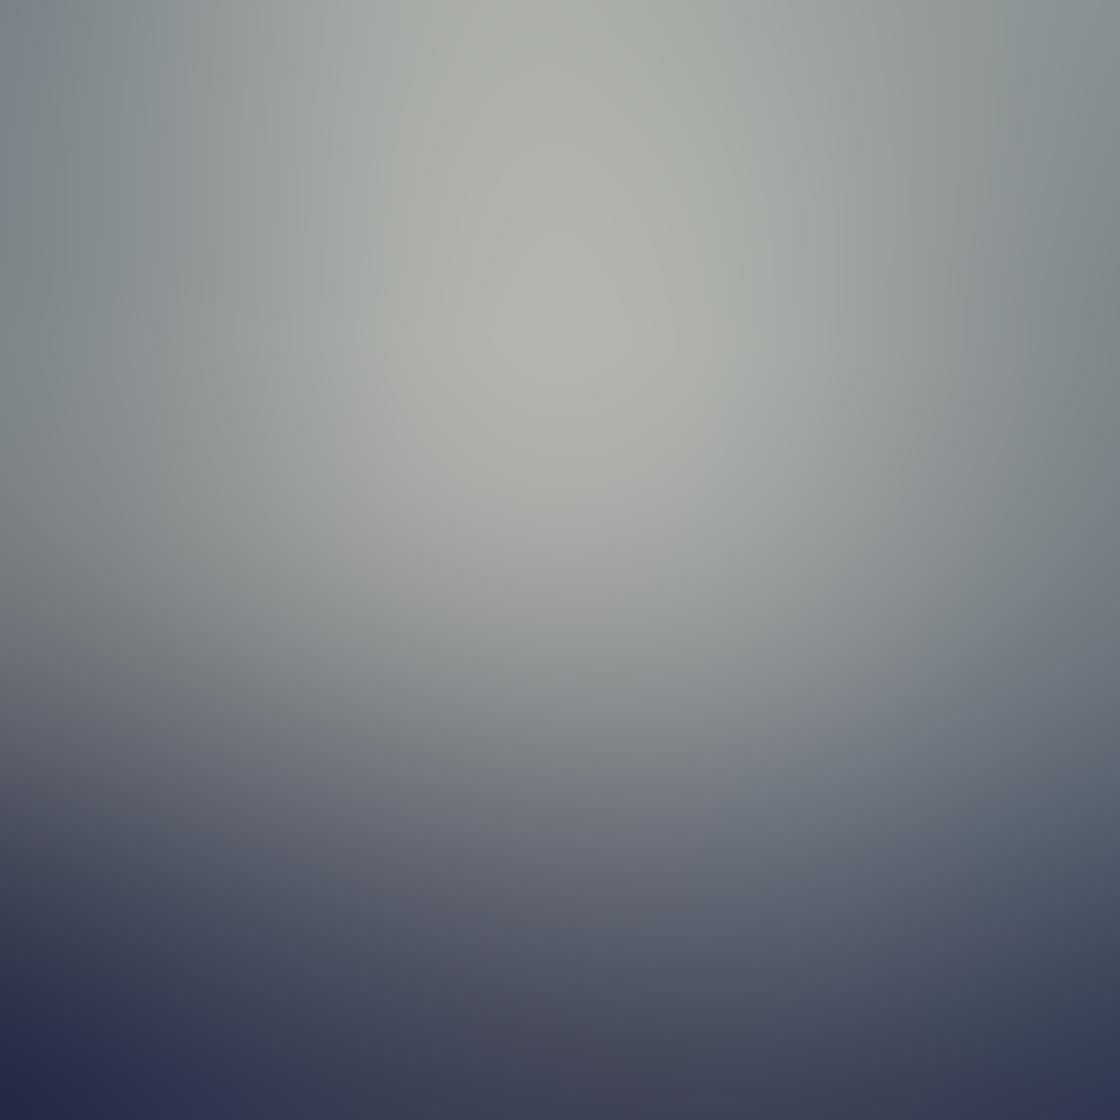 iPhone Weather Photo 23